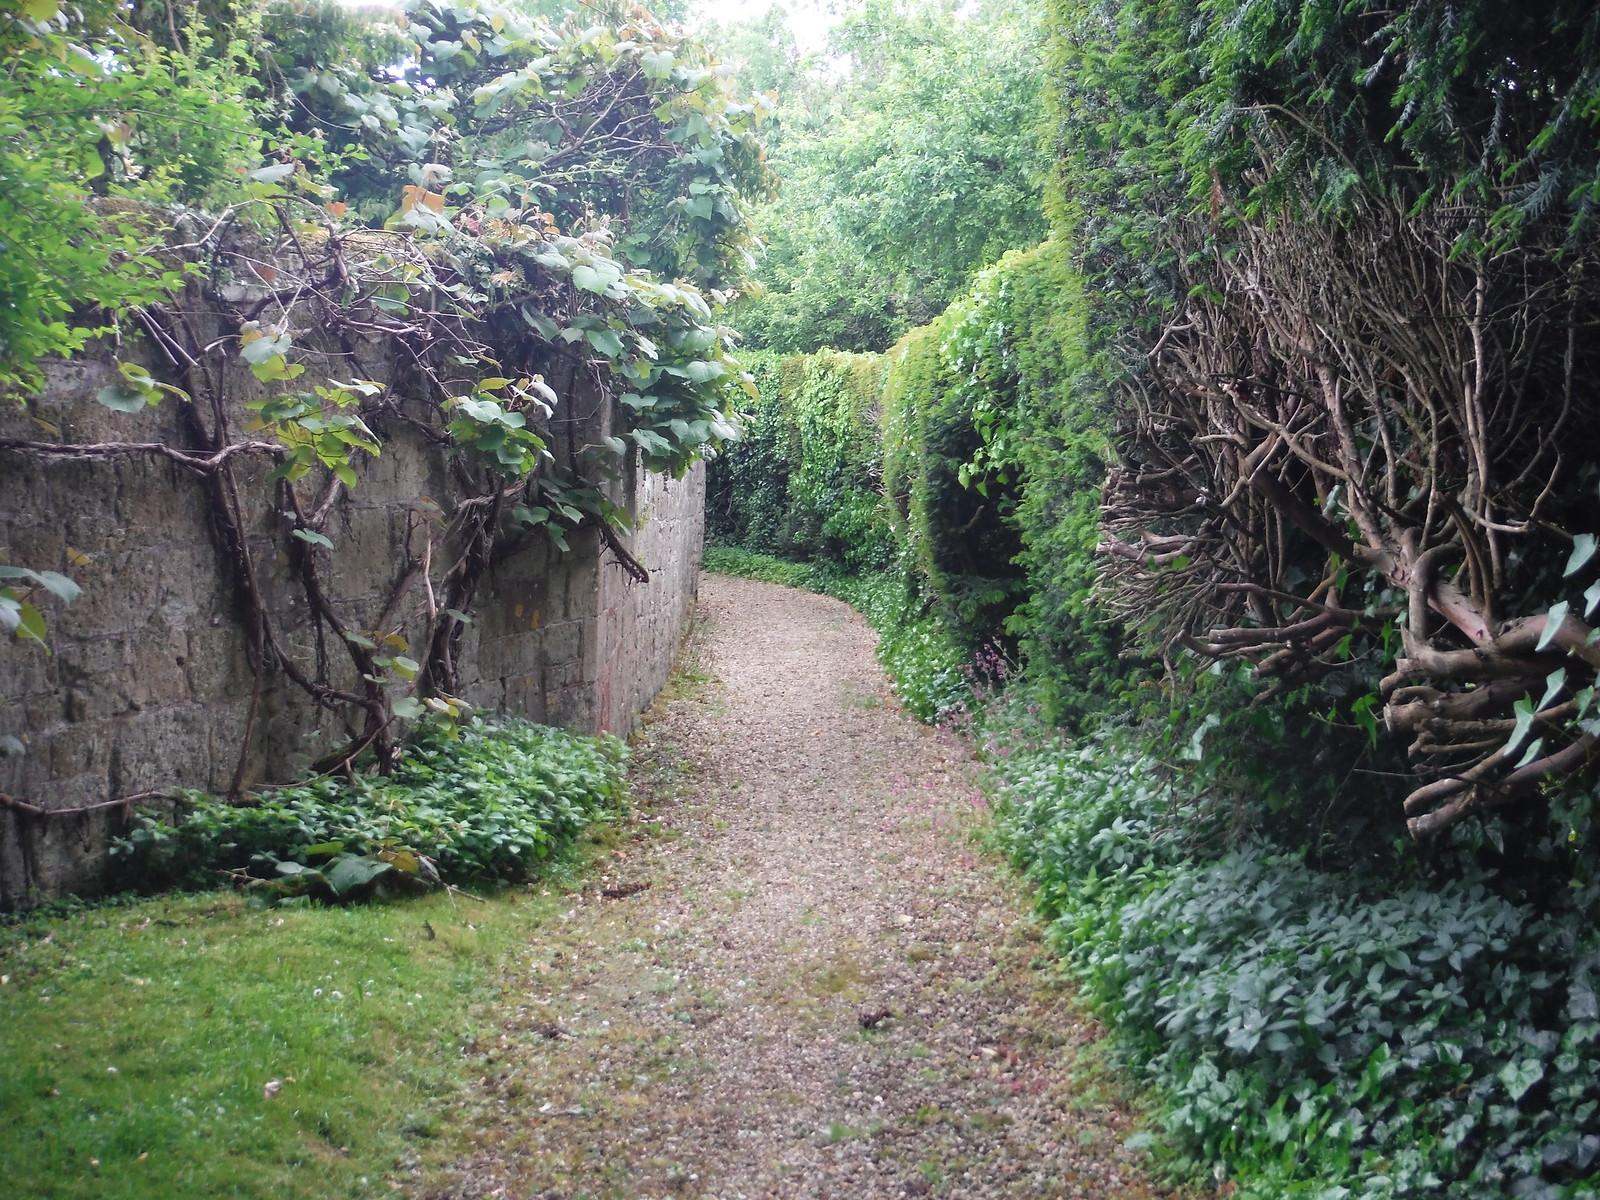 towards St. Michael, Compton Chamberlayne SWC Walk 249 Tisbury Circular via Dinton and Fovant